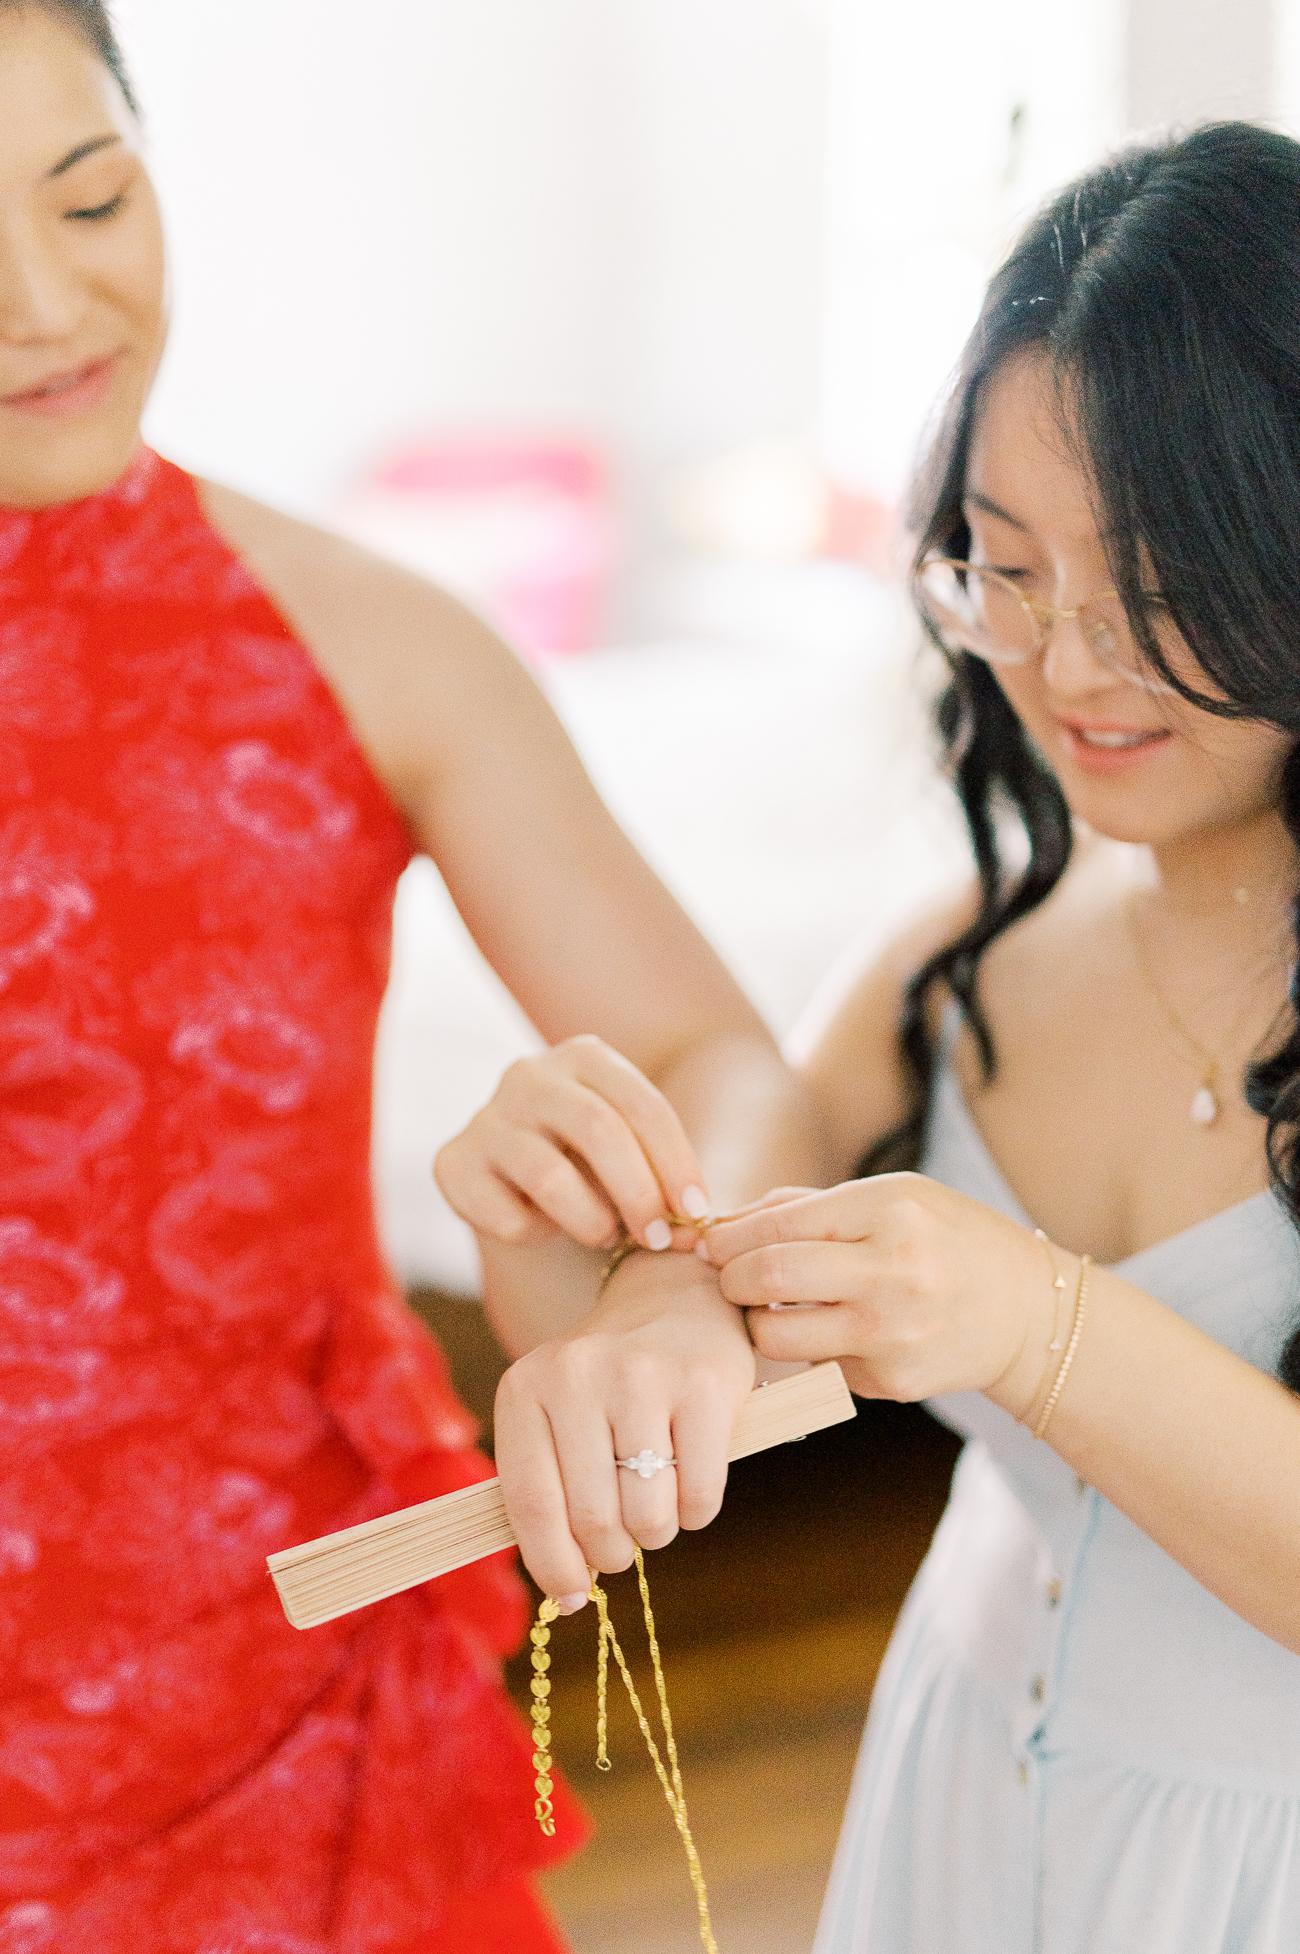 Kaitlin helping Sarah with tea ceremony jewelry